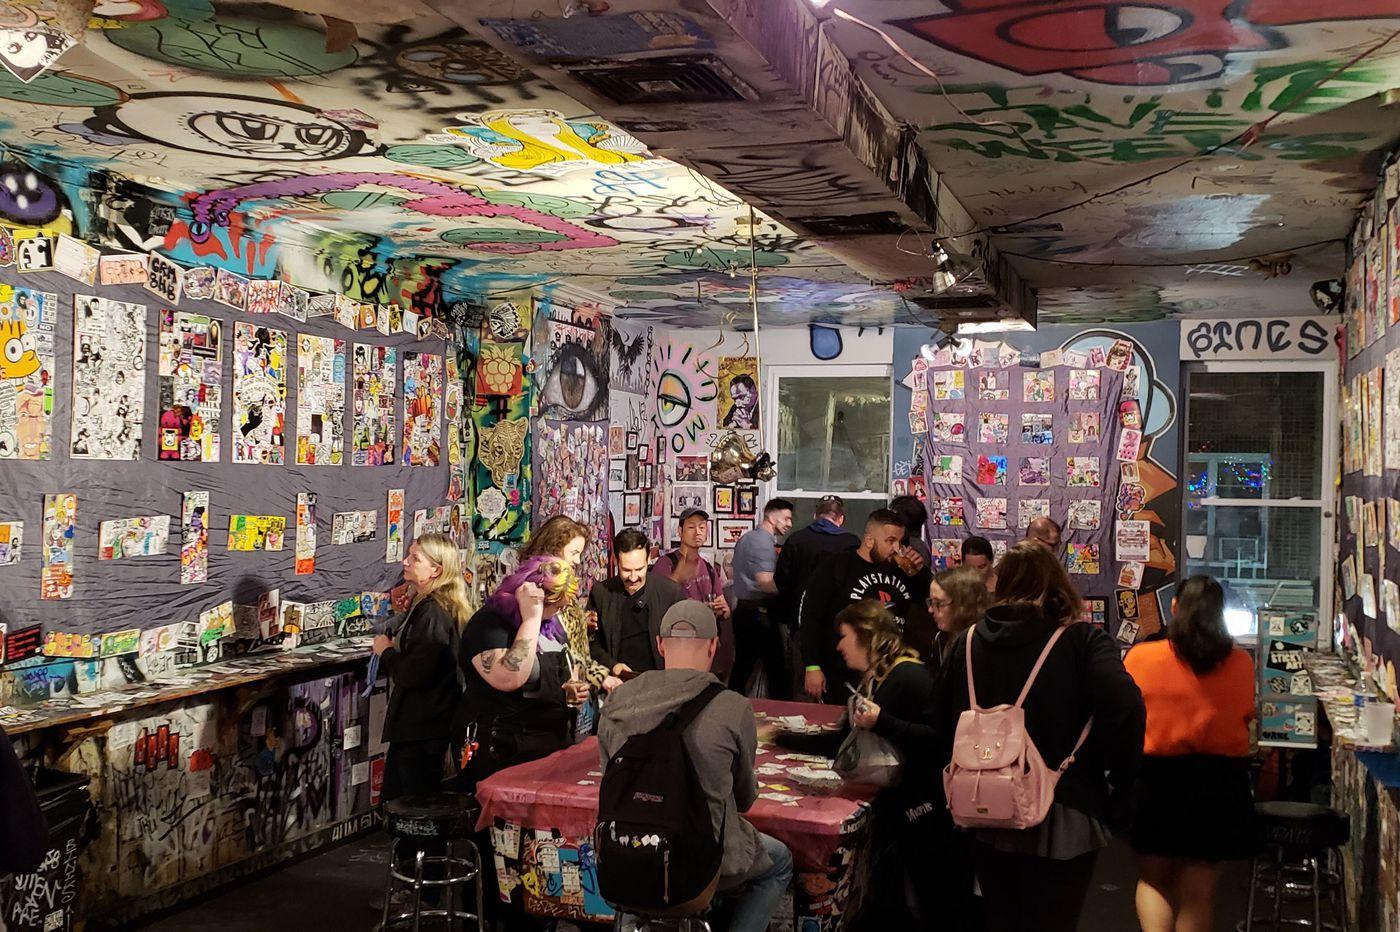 Sticker art is an 'international phenomenon,' as seen at this Tattooed Mom exhibit